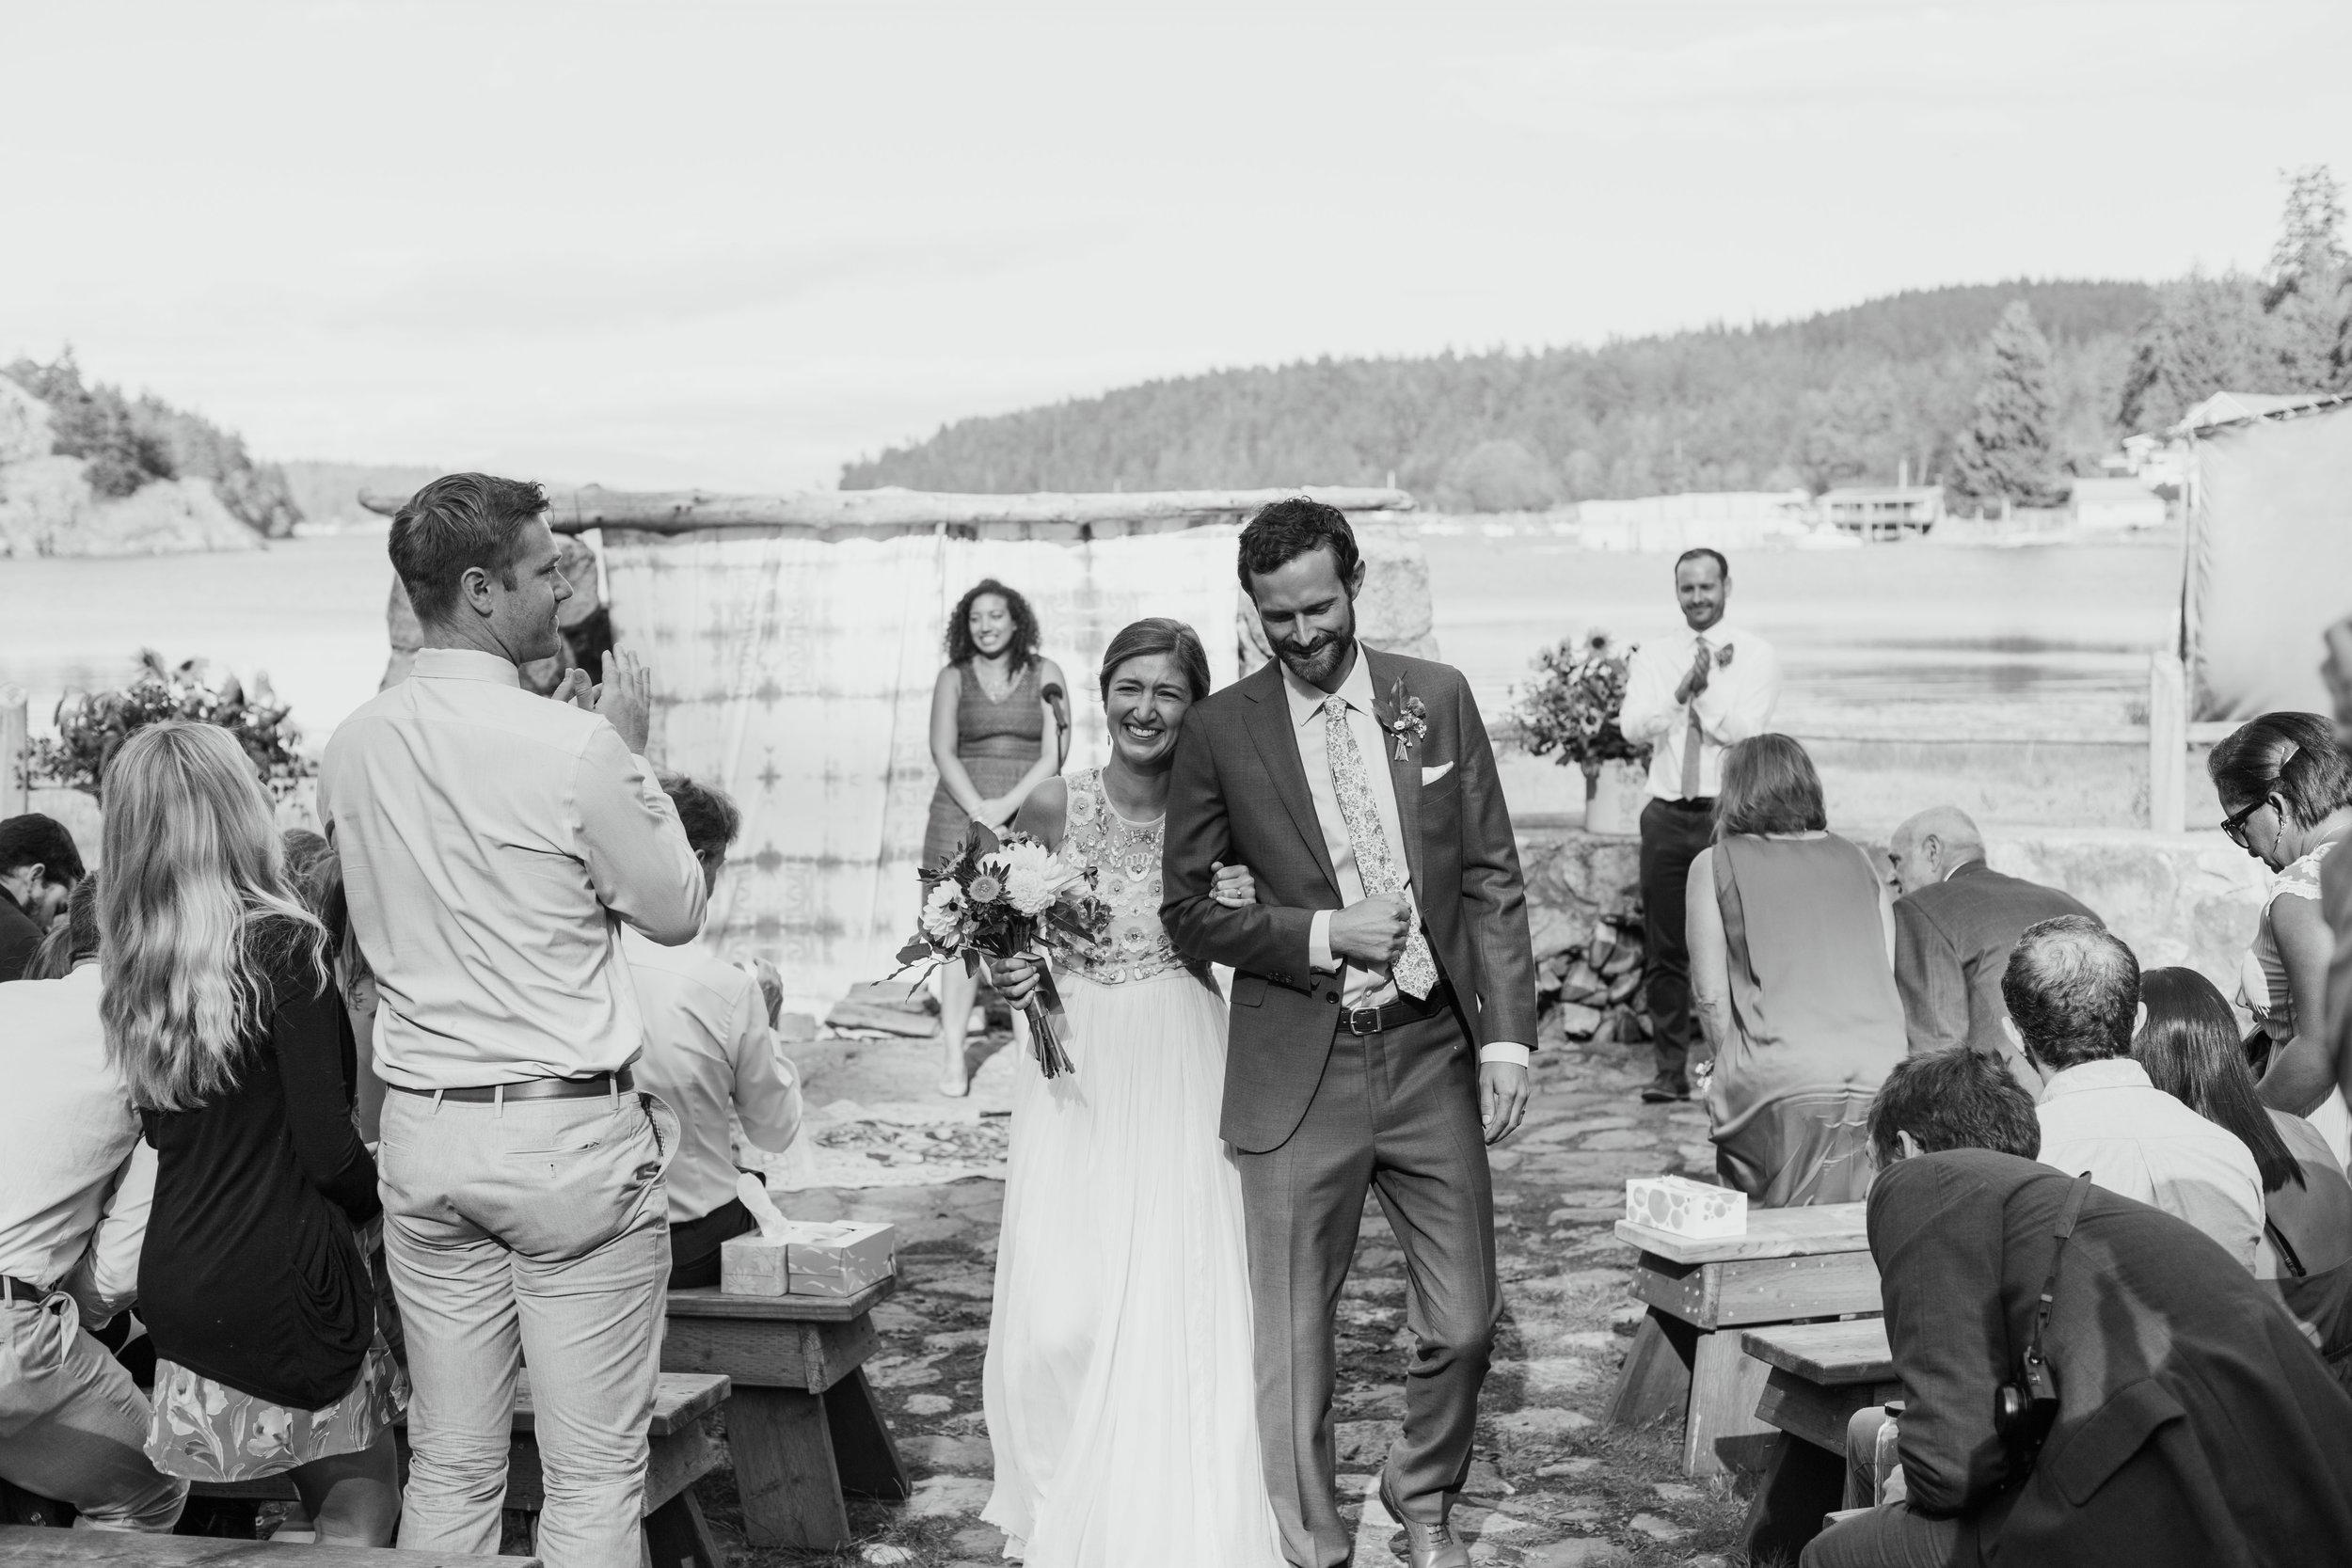 Briana&Derek_Ceremony-107.jpg